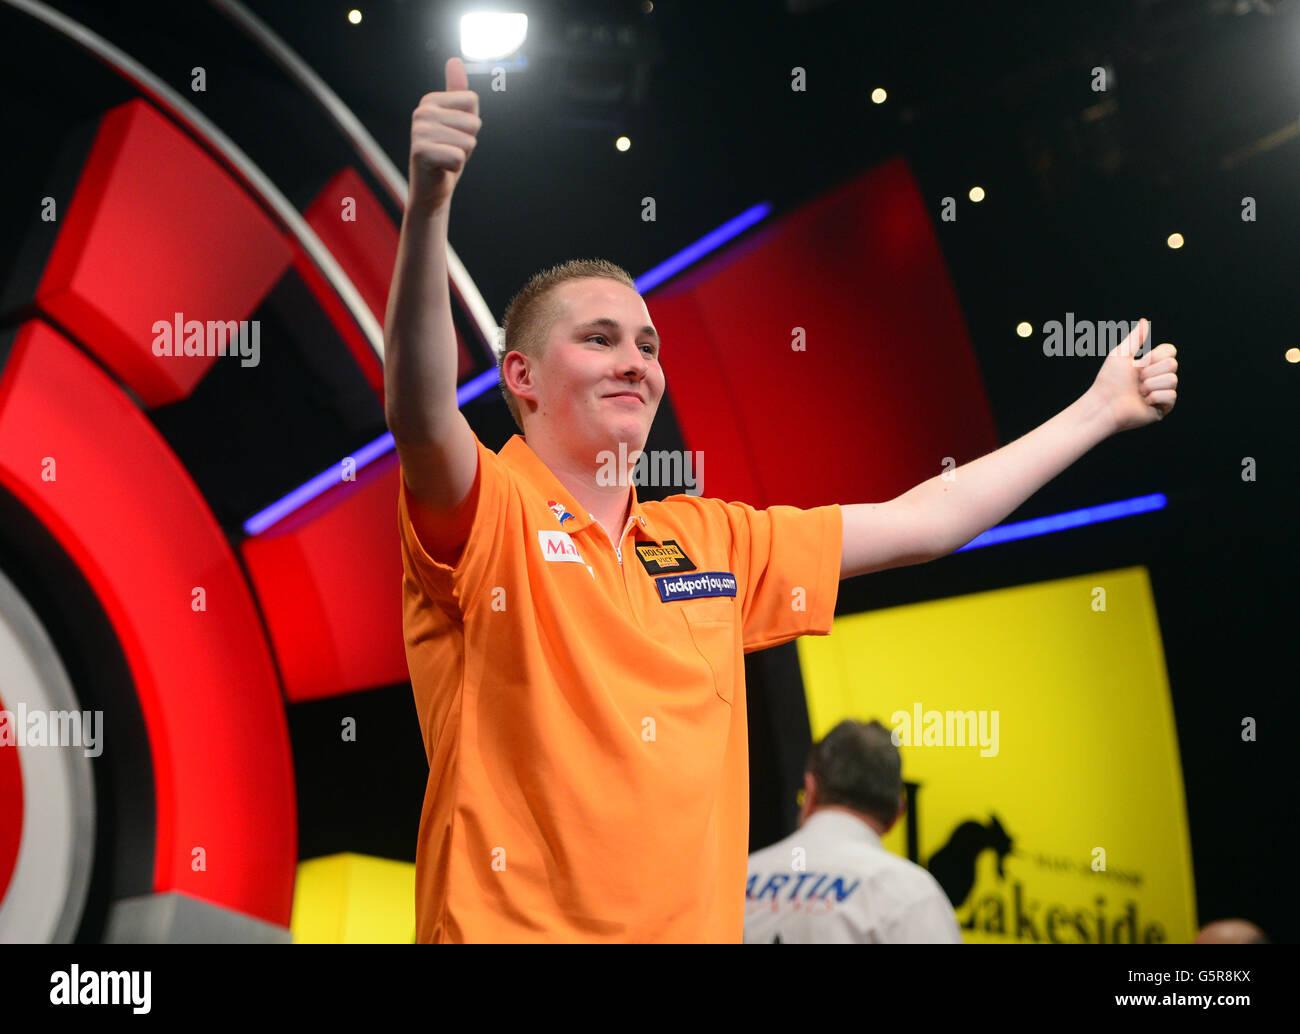 Bdo World Darts Championships Stock Photos & Bdo World Darts